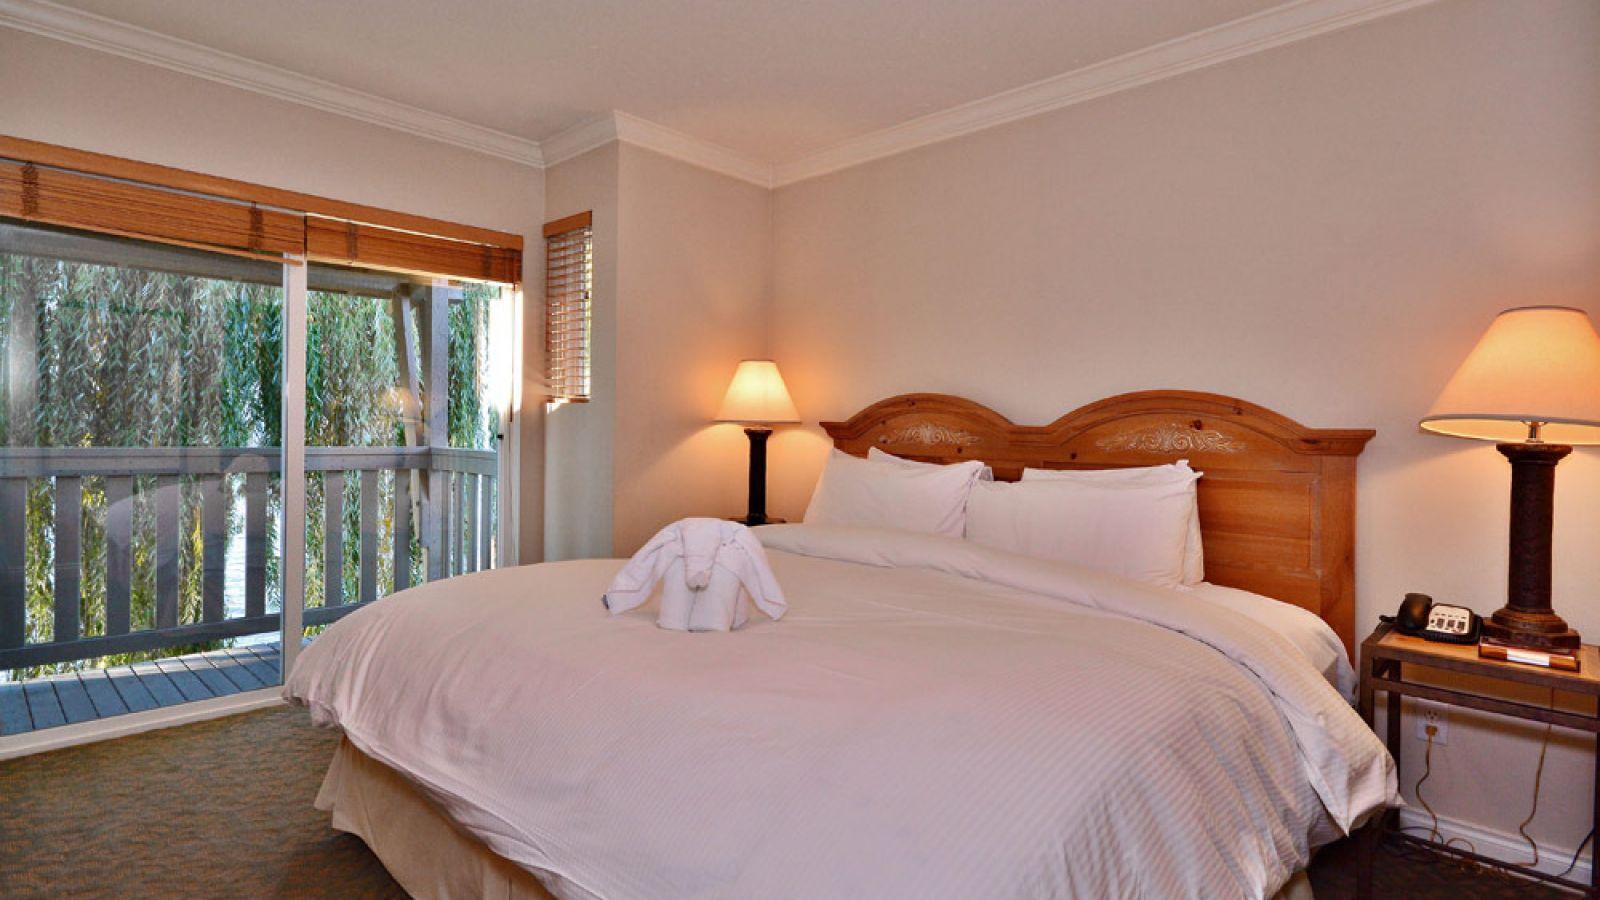 Two Bedroom Villa Beachfront at Manteo